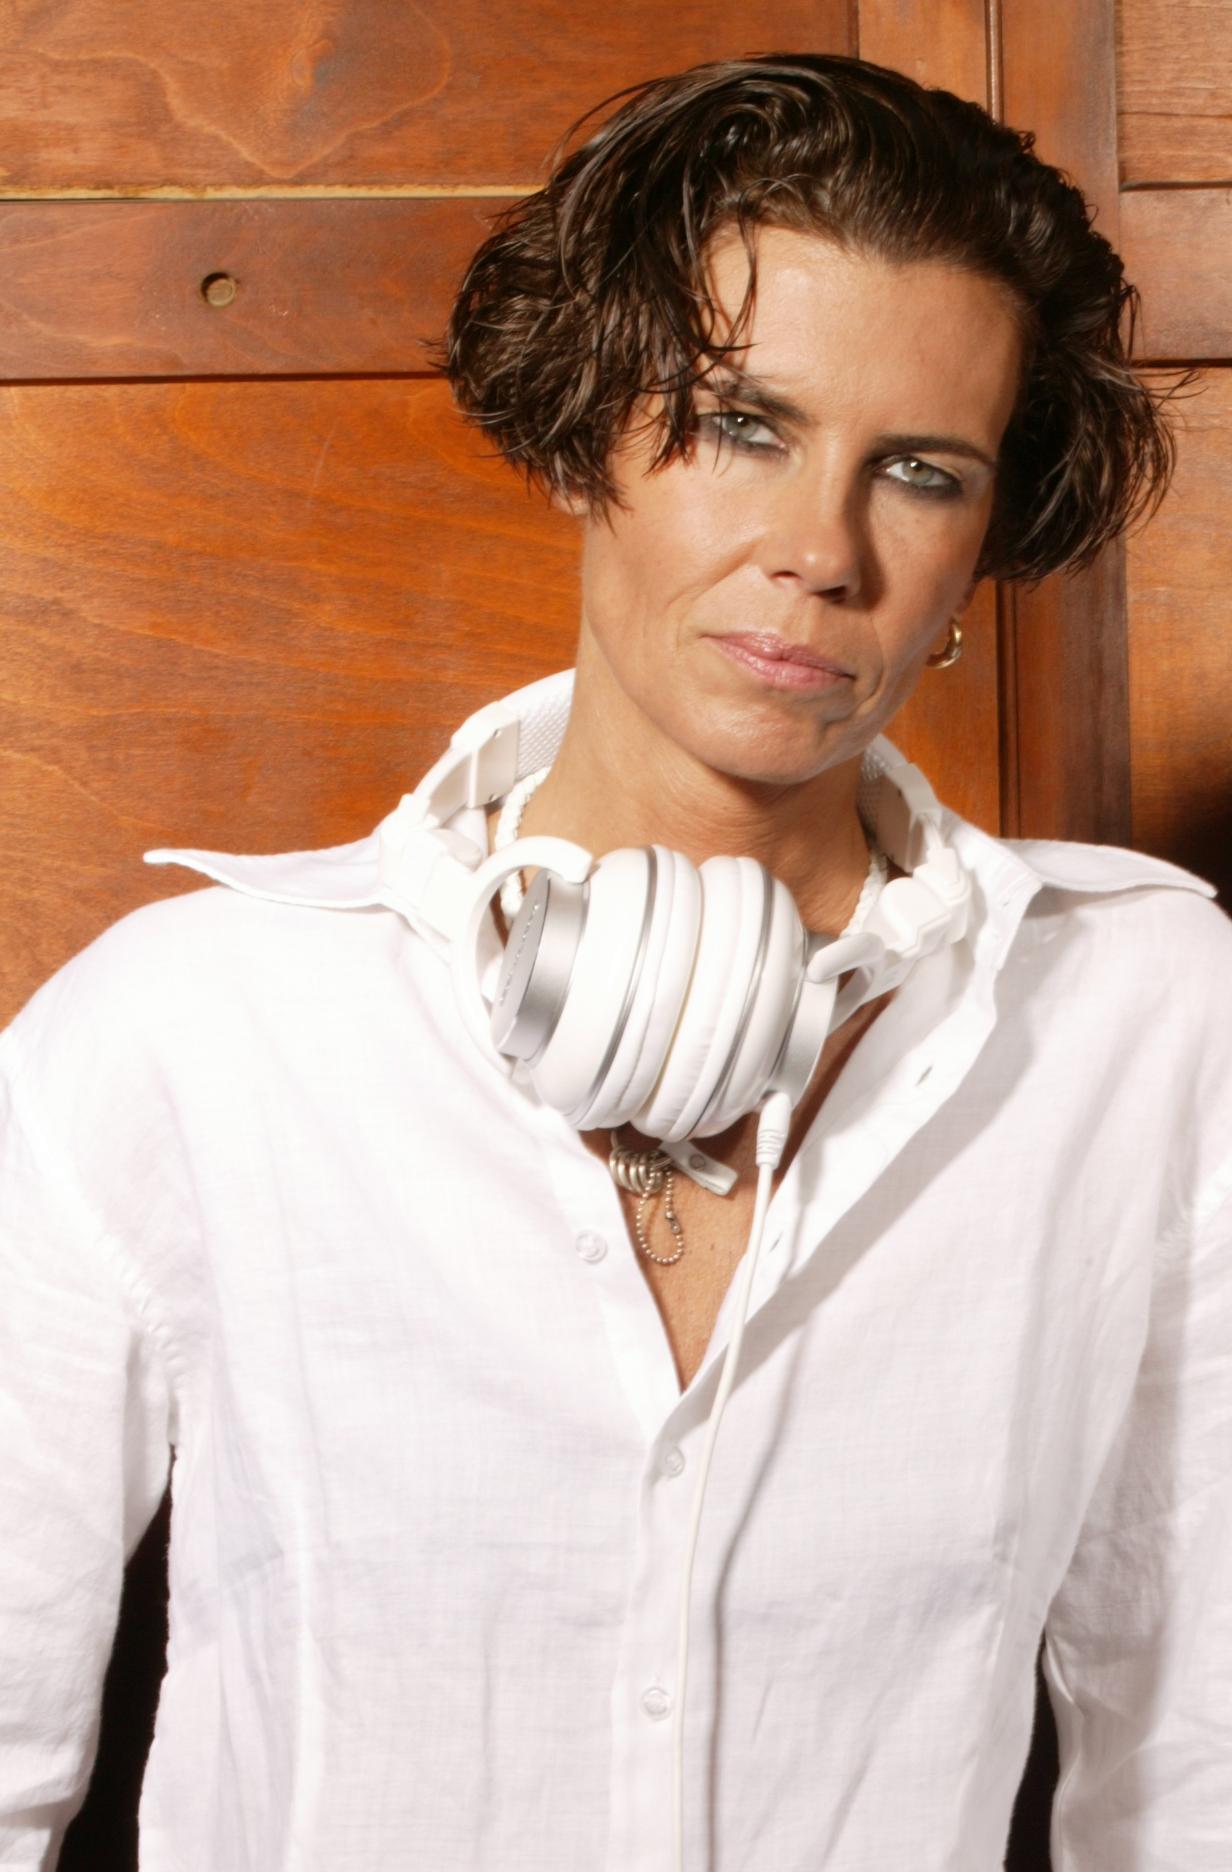 Berlin Summer Rave DJ-Contest: Miss Thunderpussy